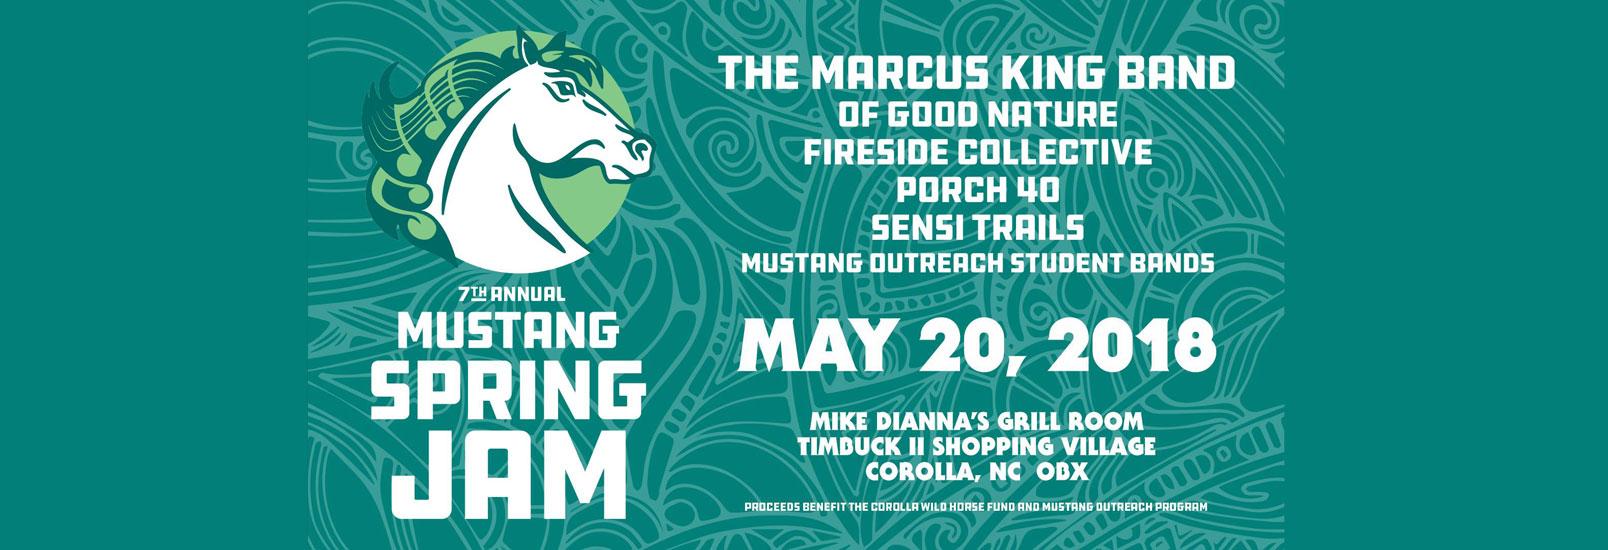 Corolla Mustang Spring Jam May 2018